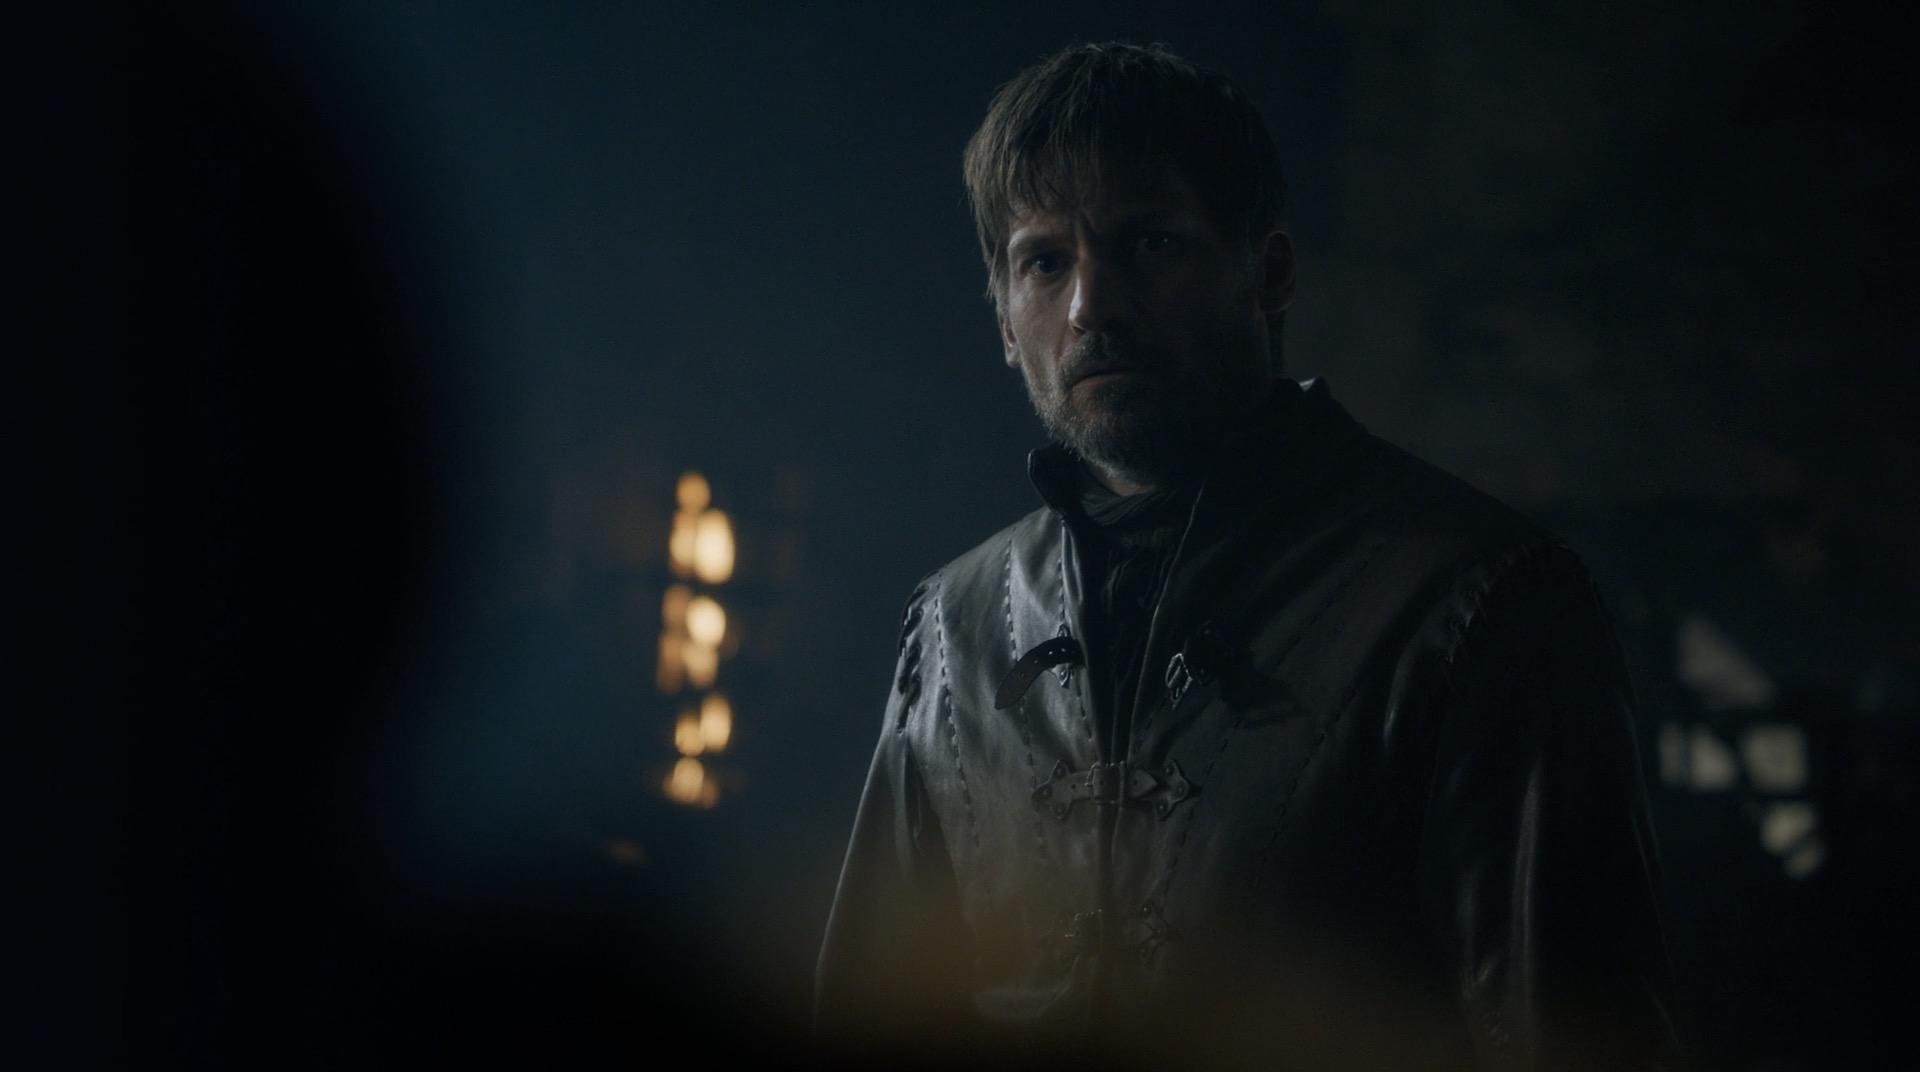 Game of Thrones S08E02 Jaime Lannister